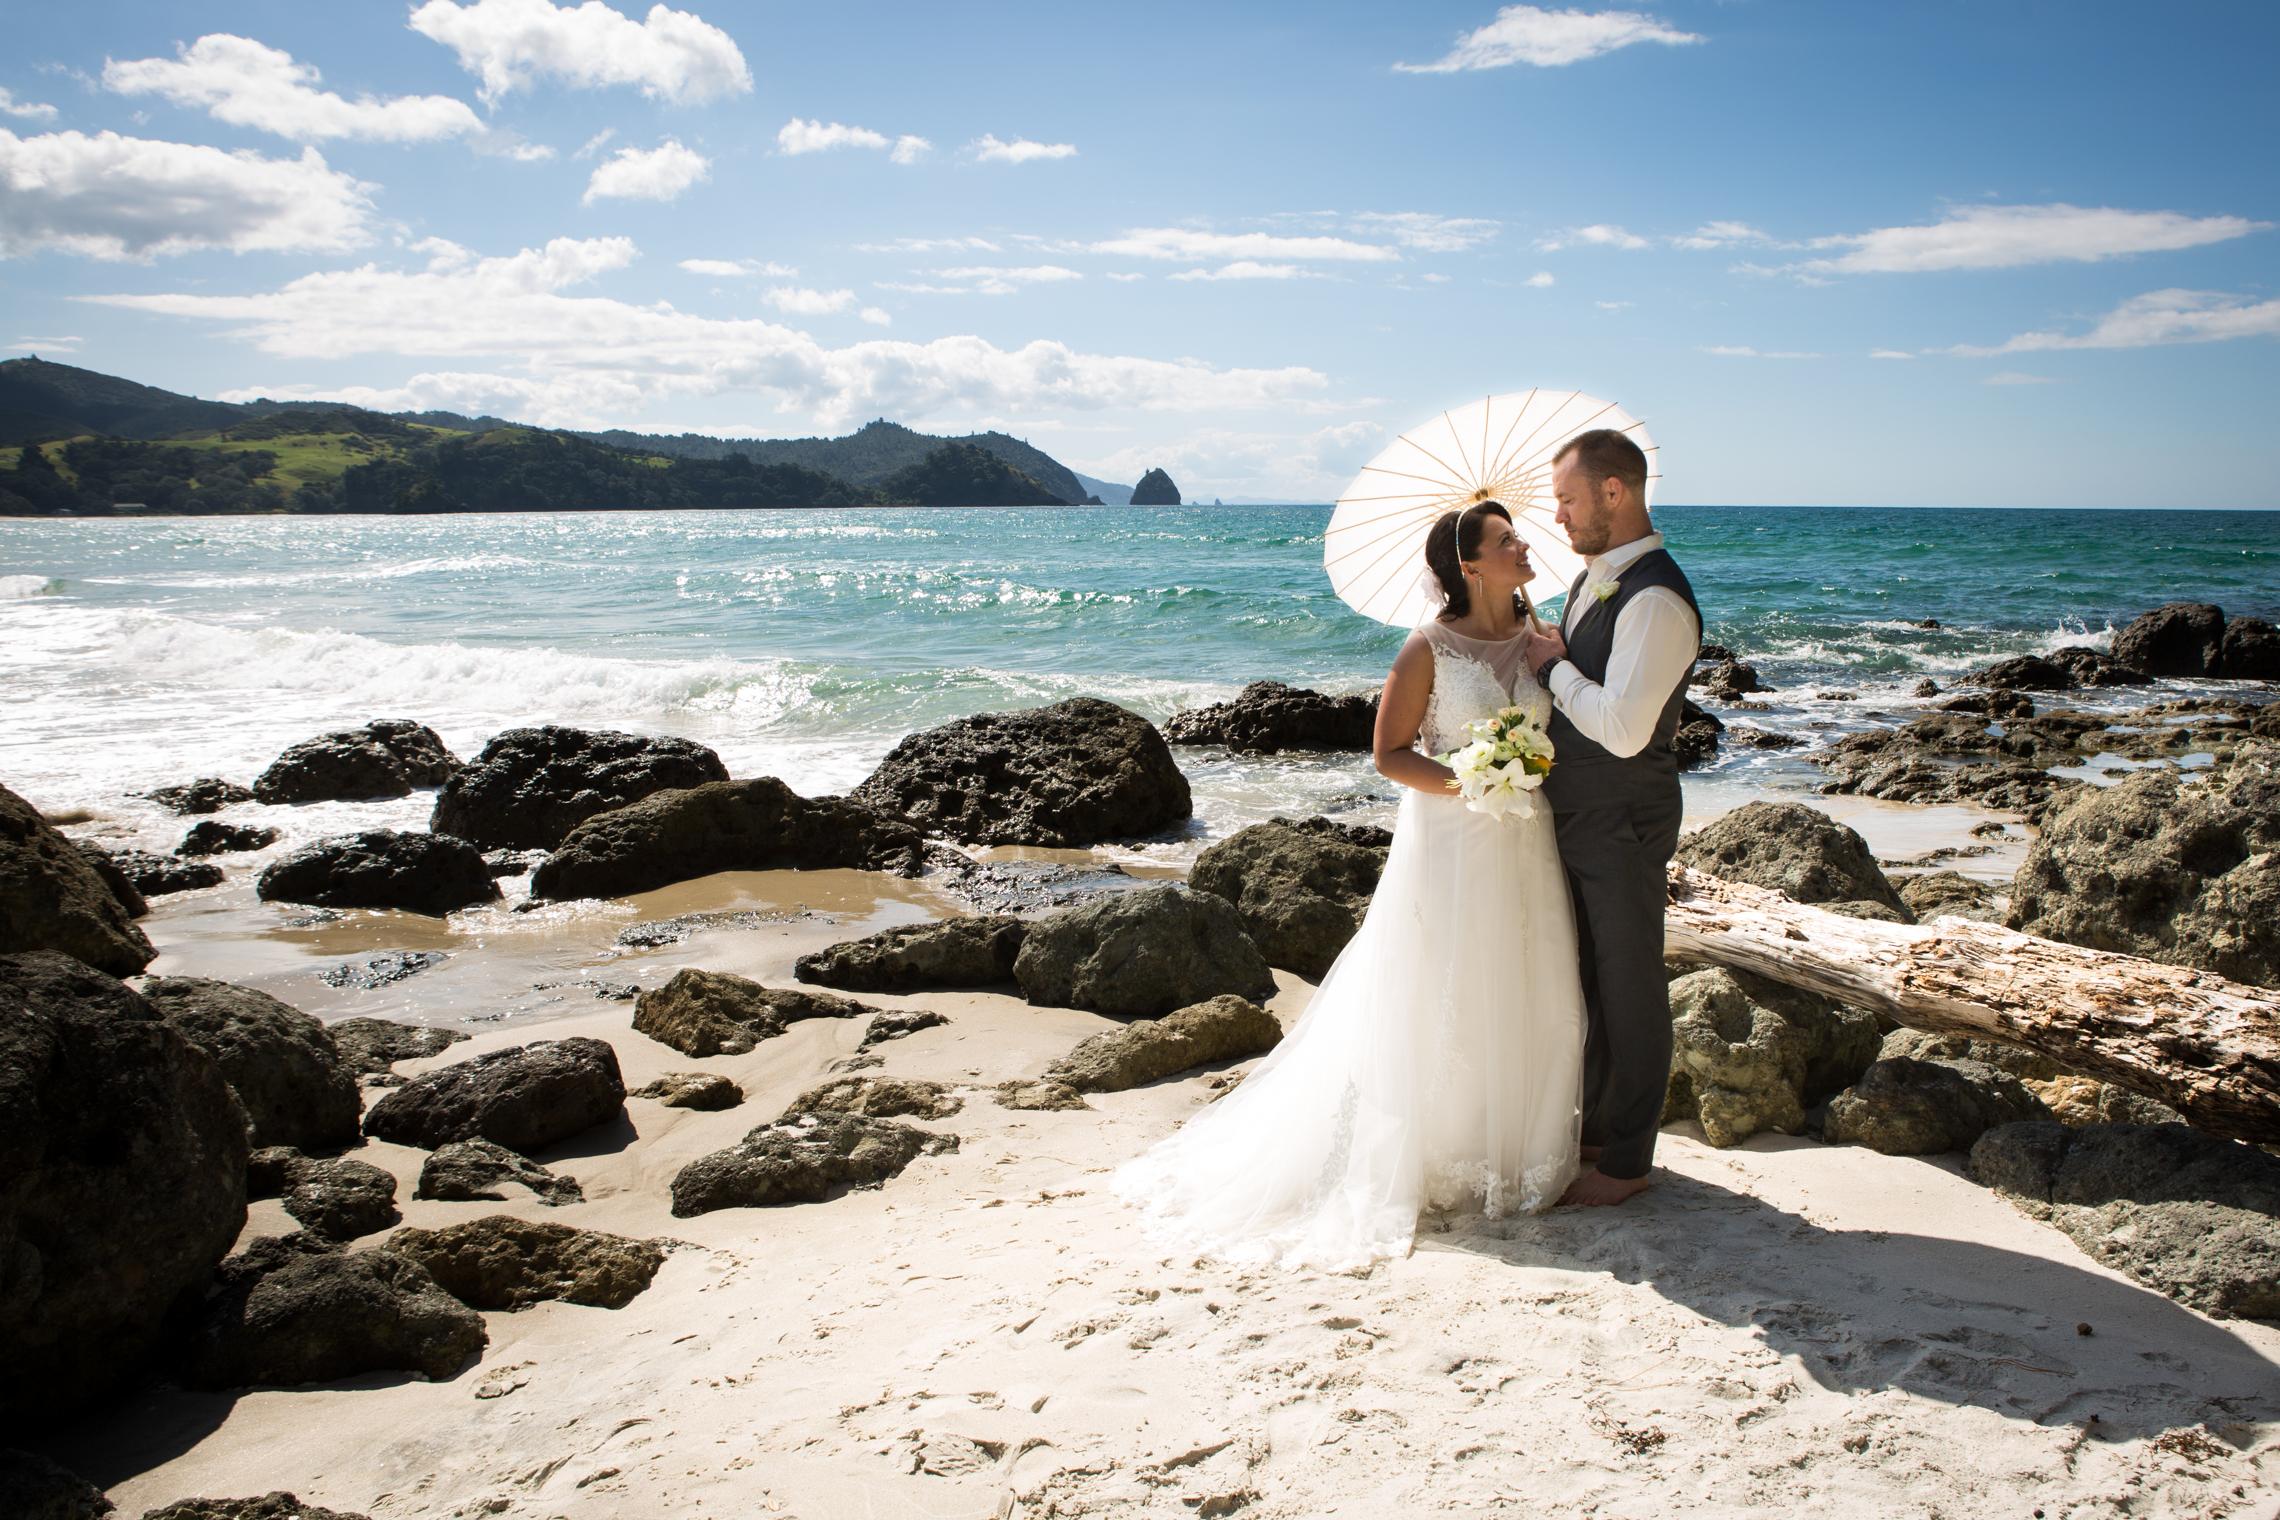 Wedding photographer Auckland testimonial-5